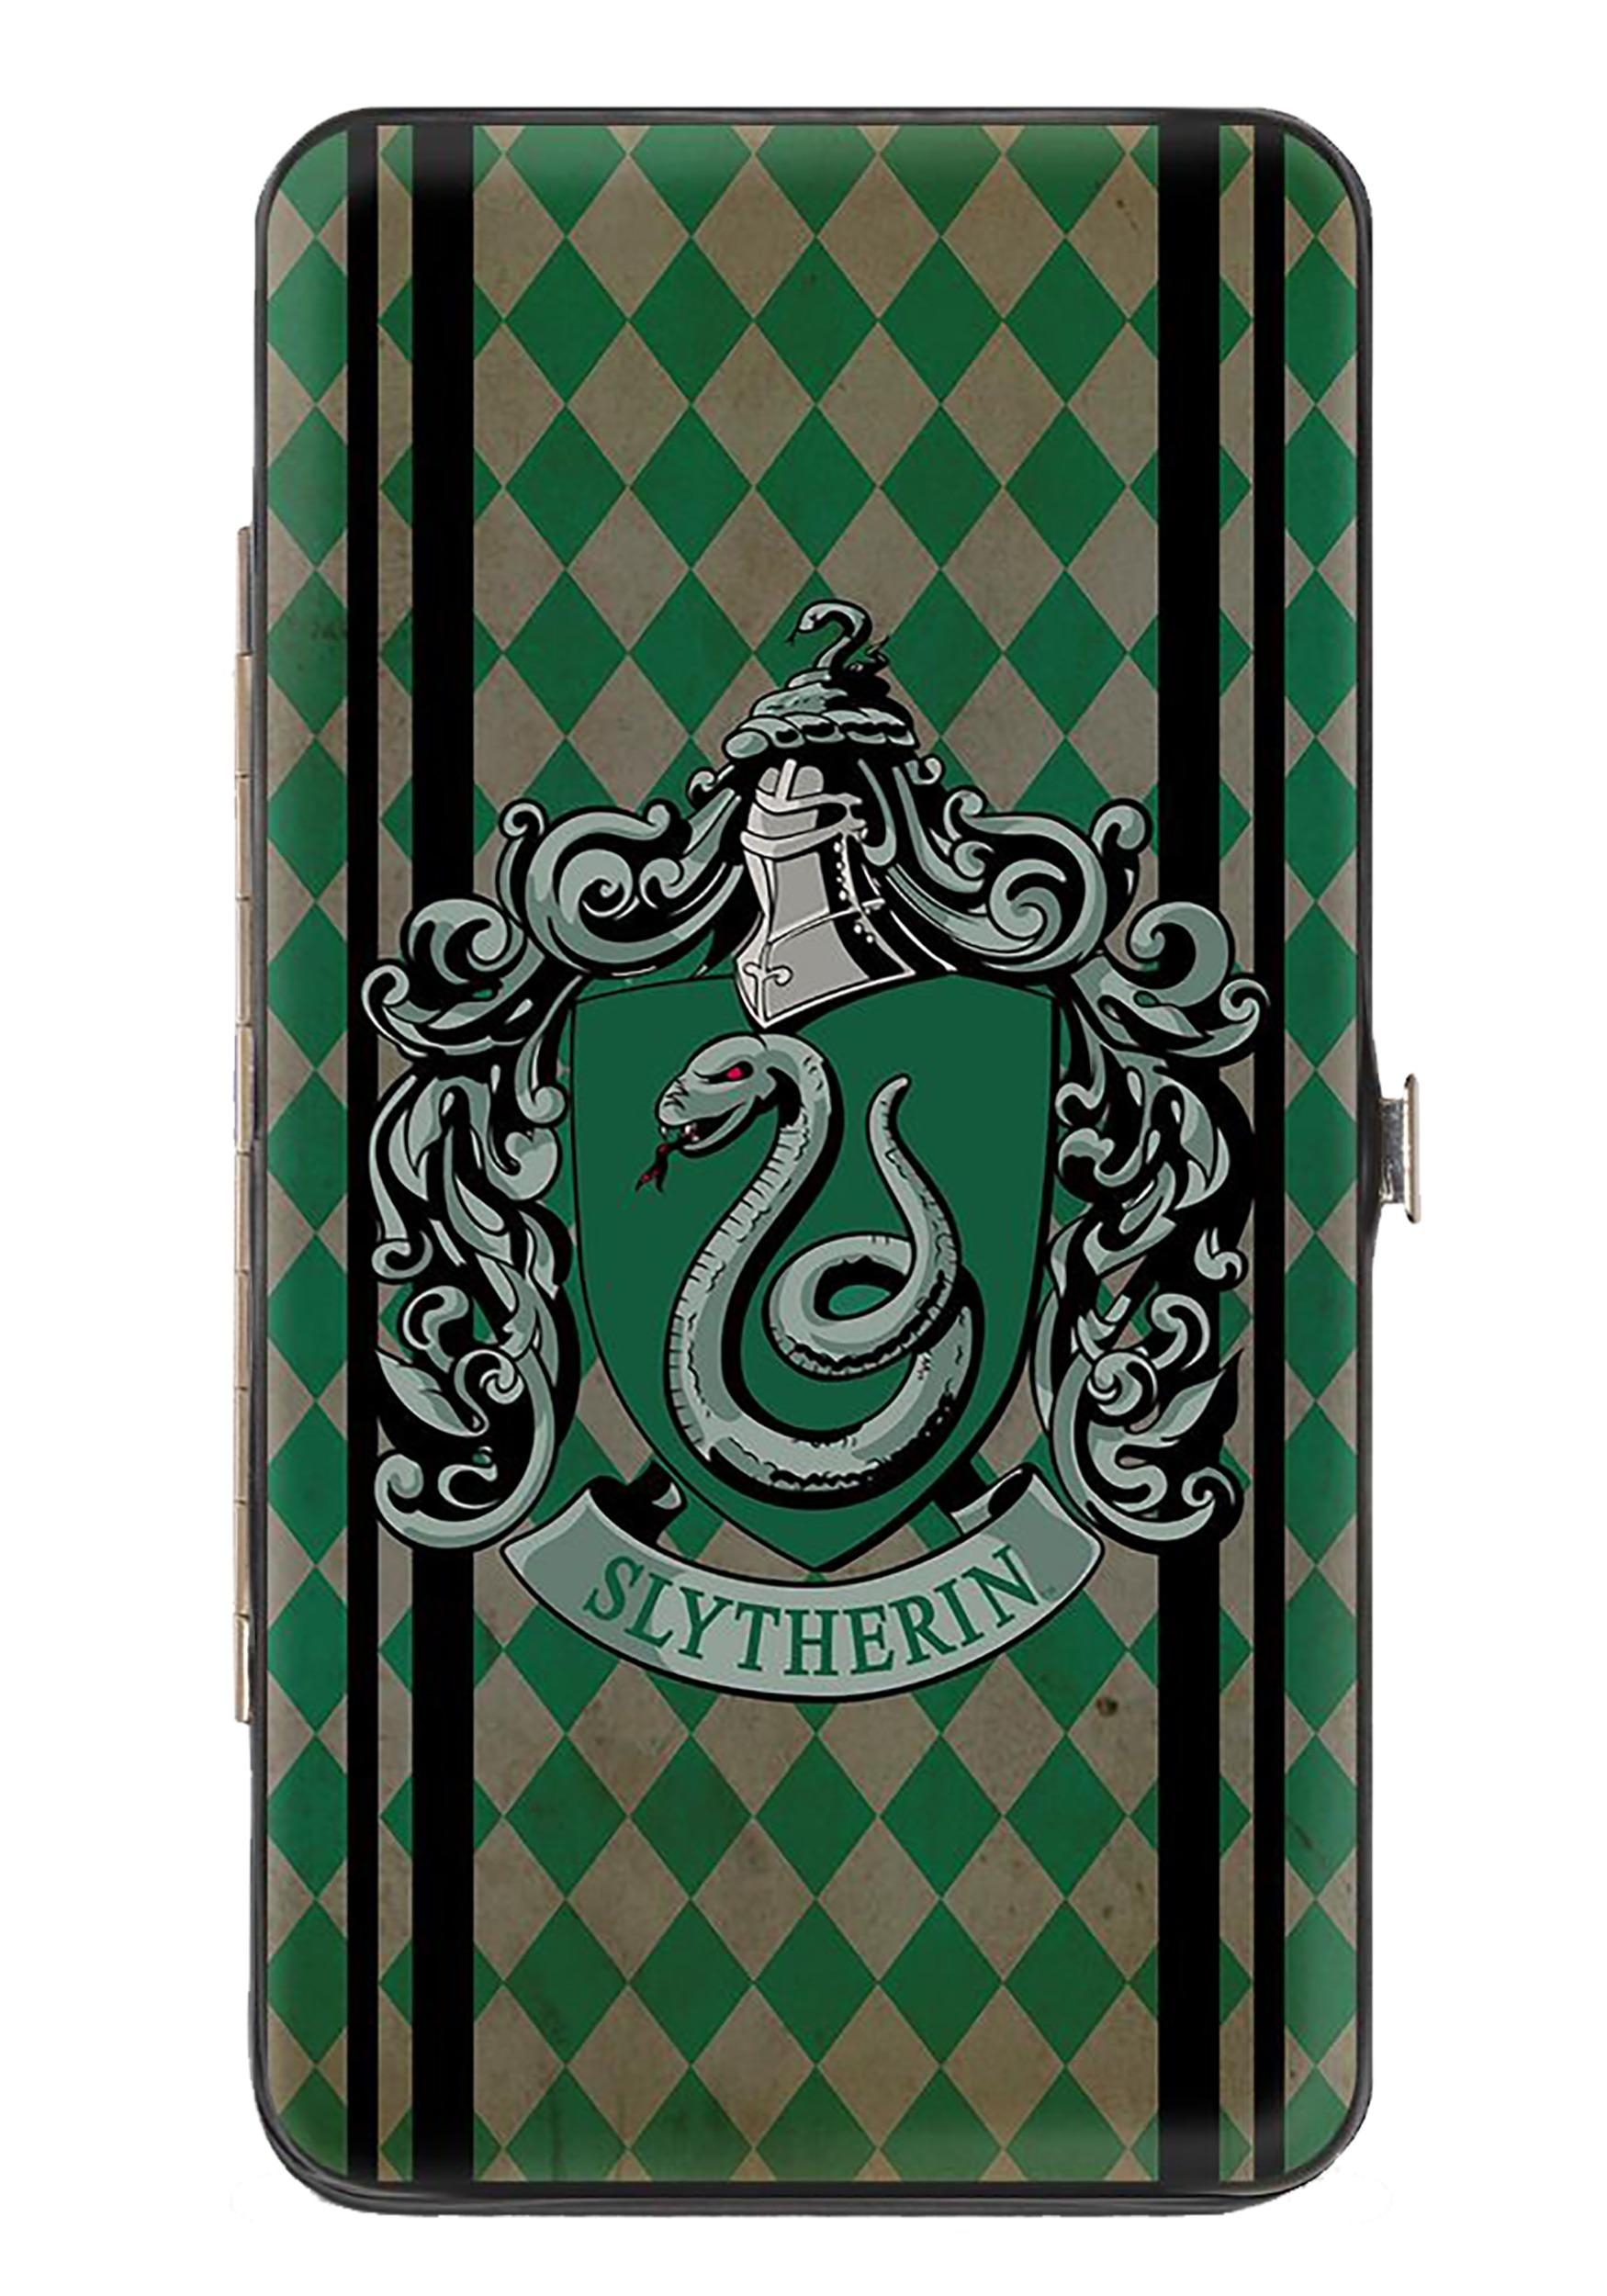 Slytherin_Crest_Harry_Potter_Hinged_Wallet